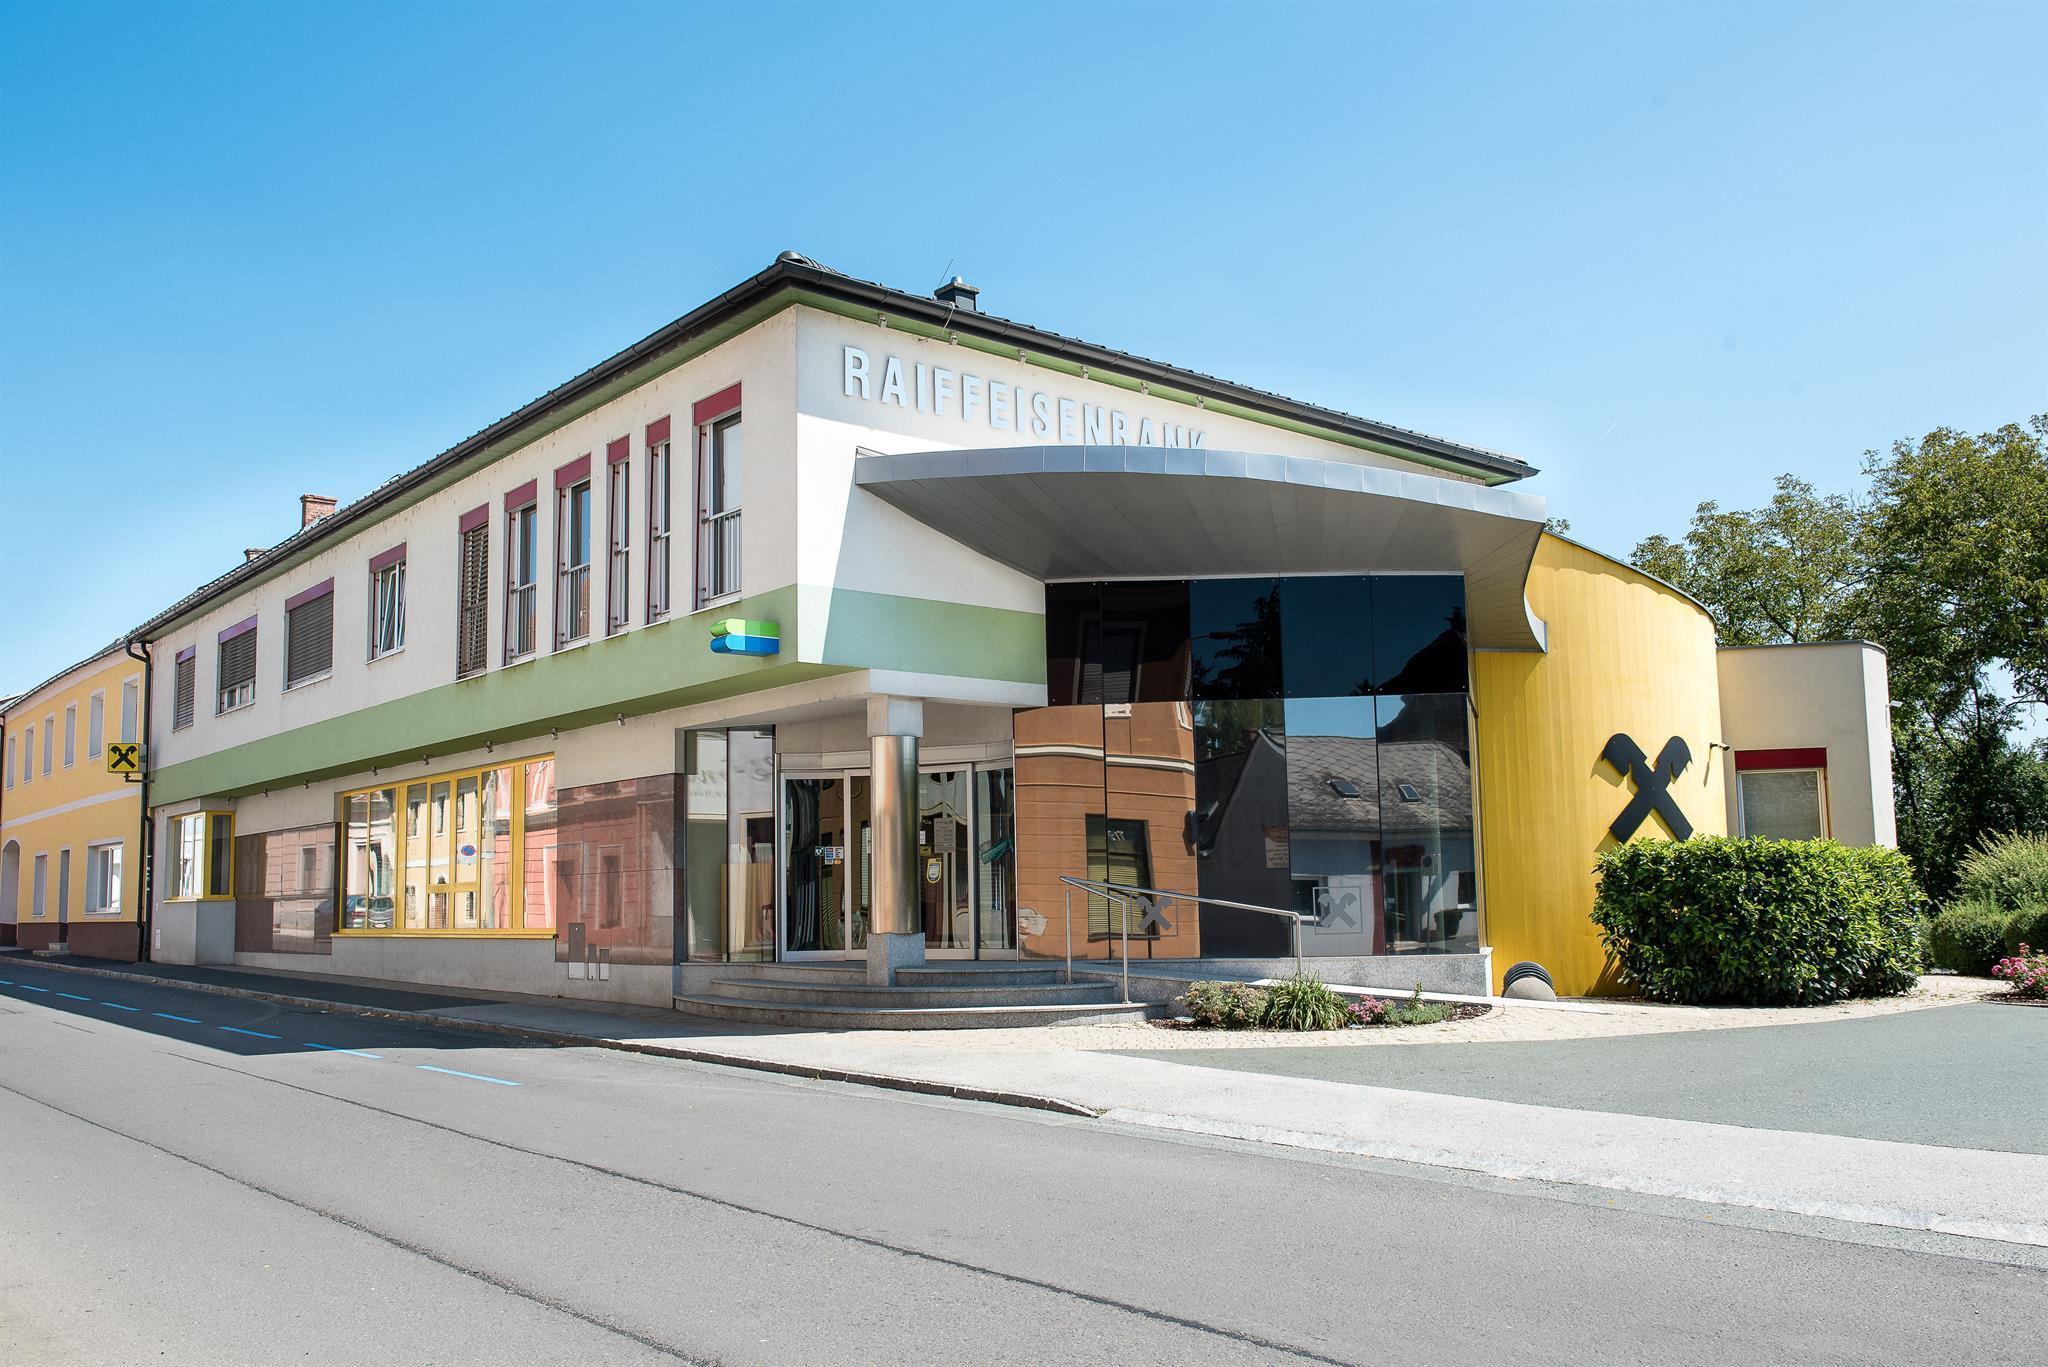 Raiffeisenbezirksbank